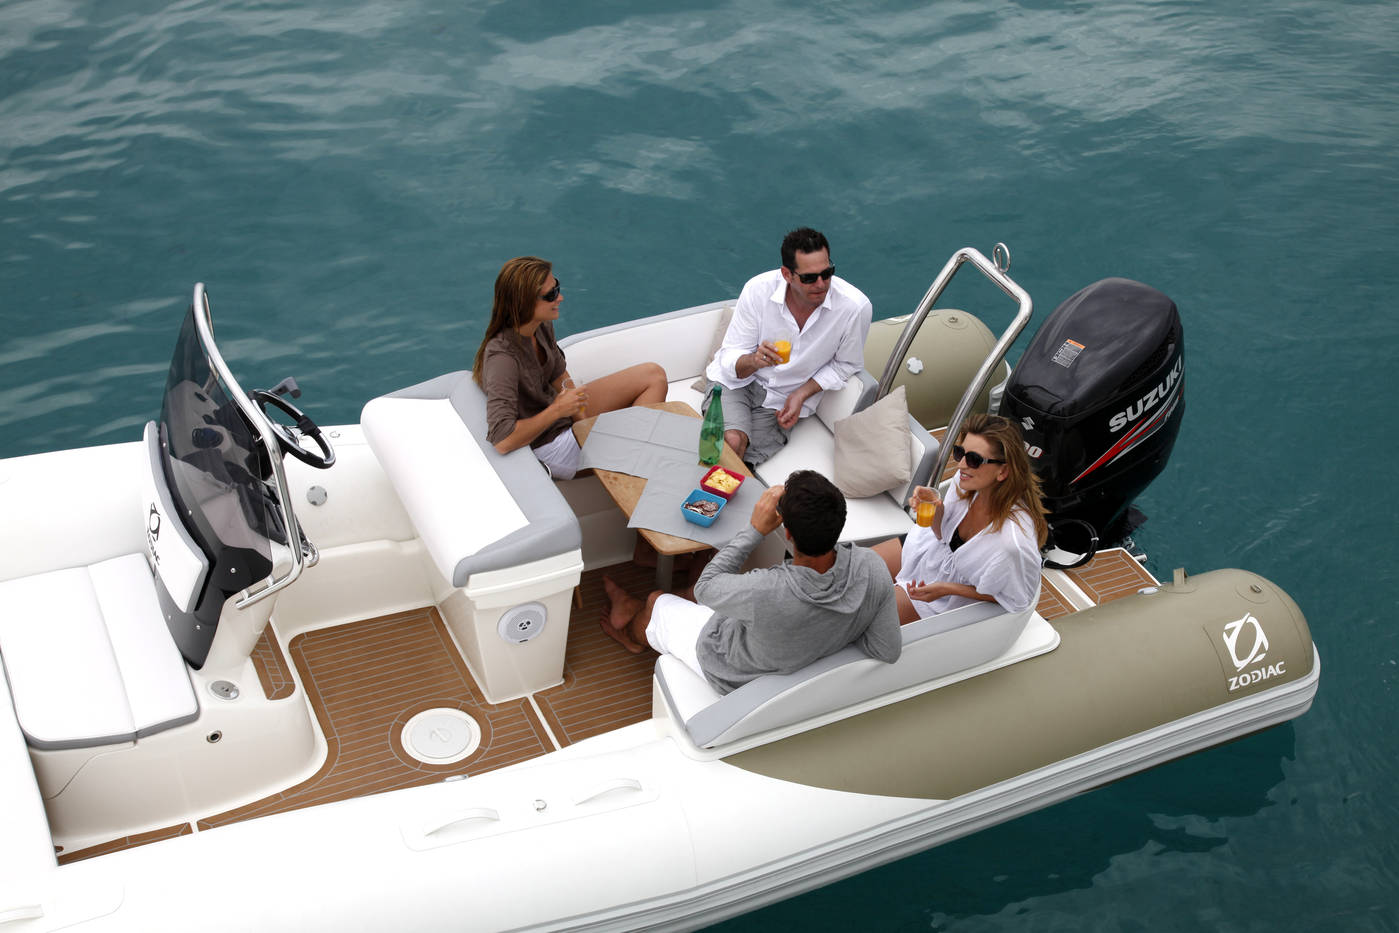 Надуваеми пластмасови лодки РИБ Зодиак/ RIB Zodiac N-zo